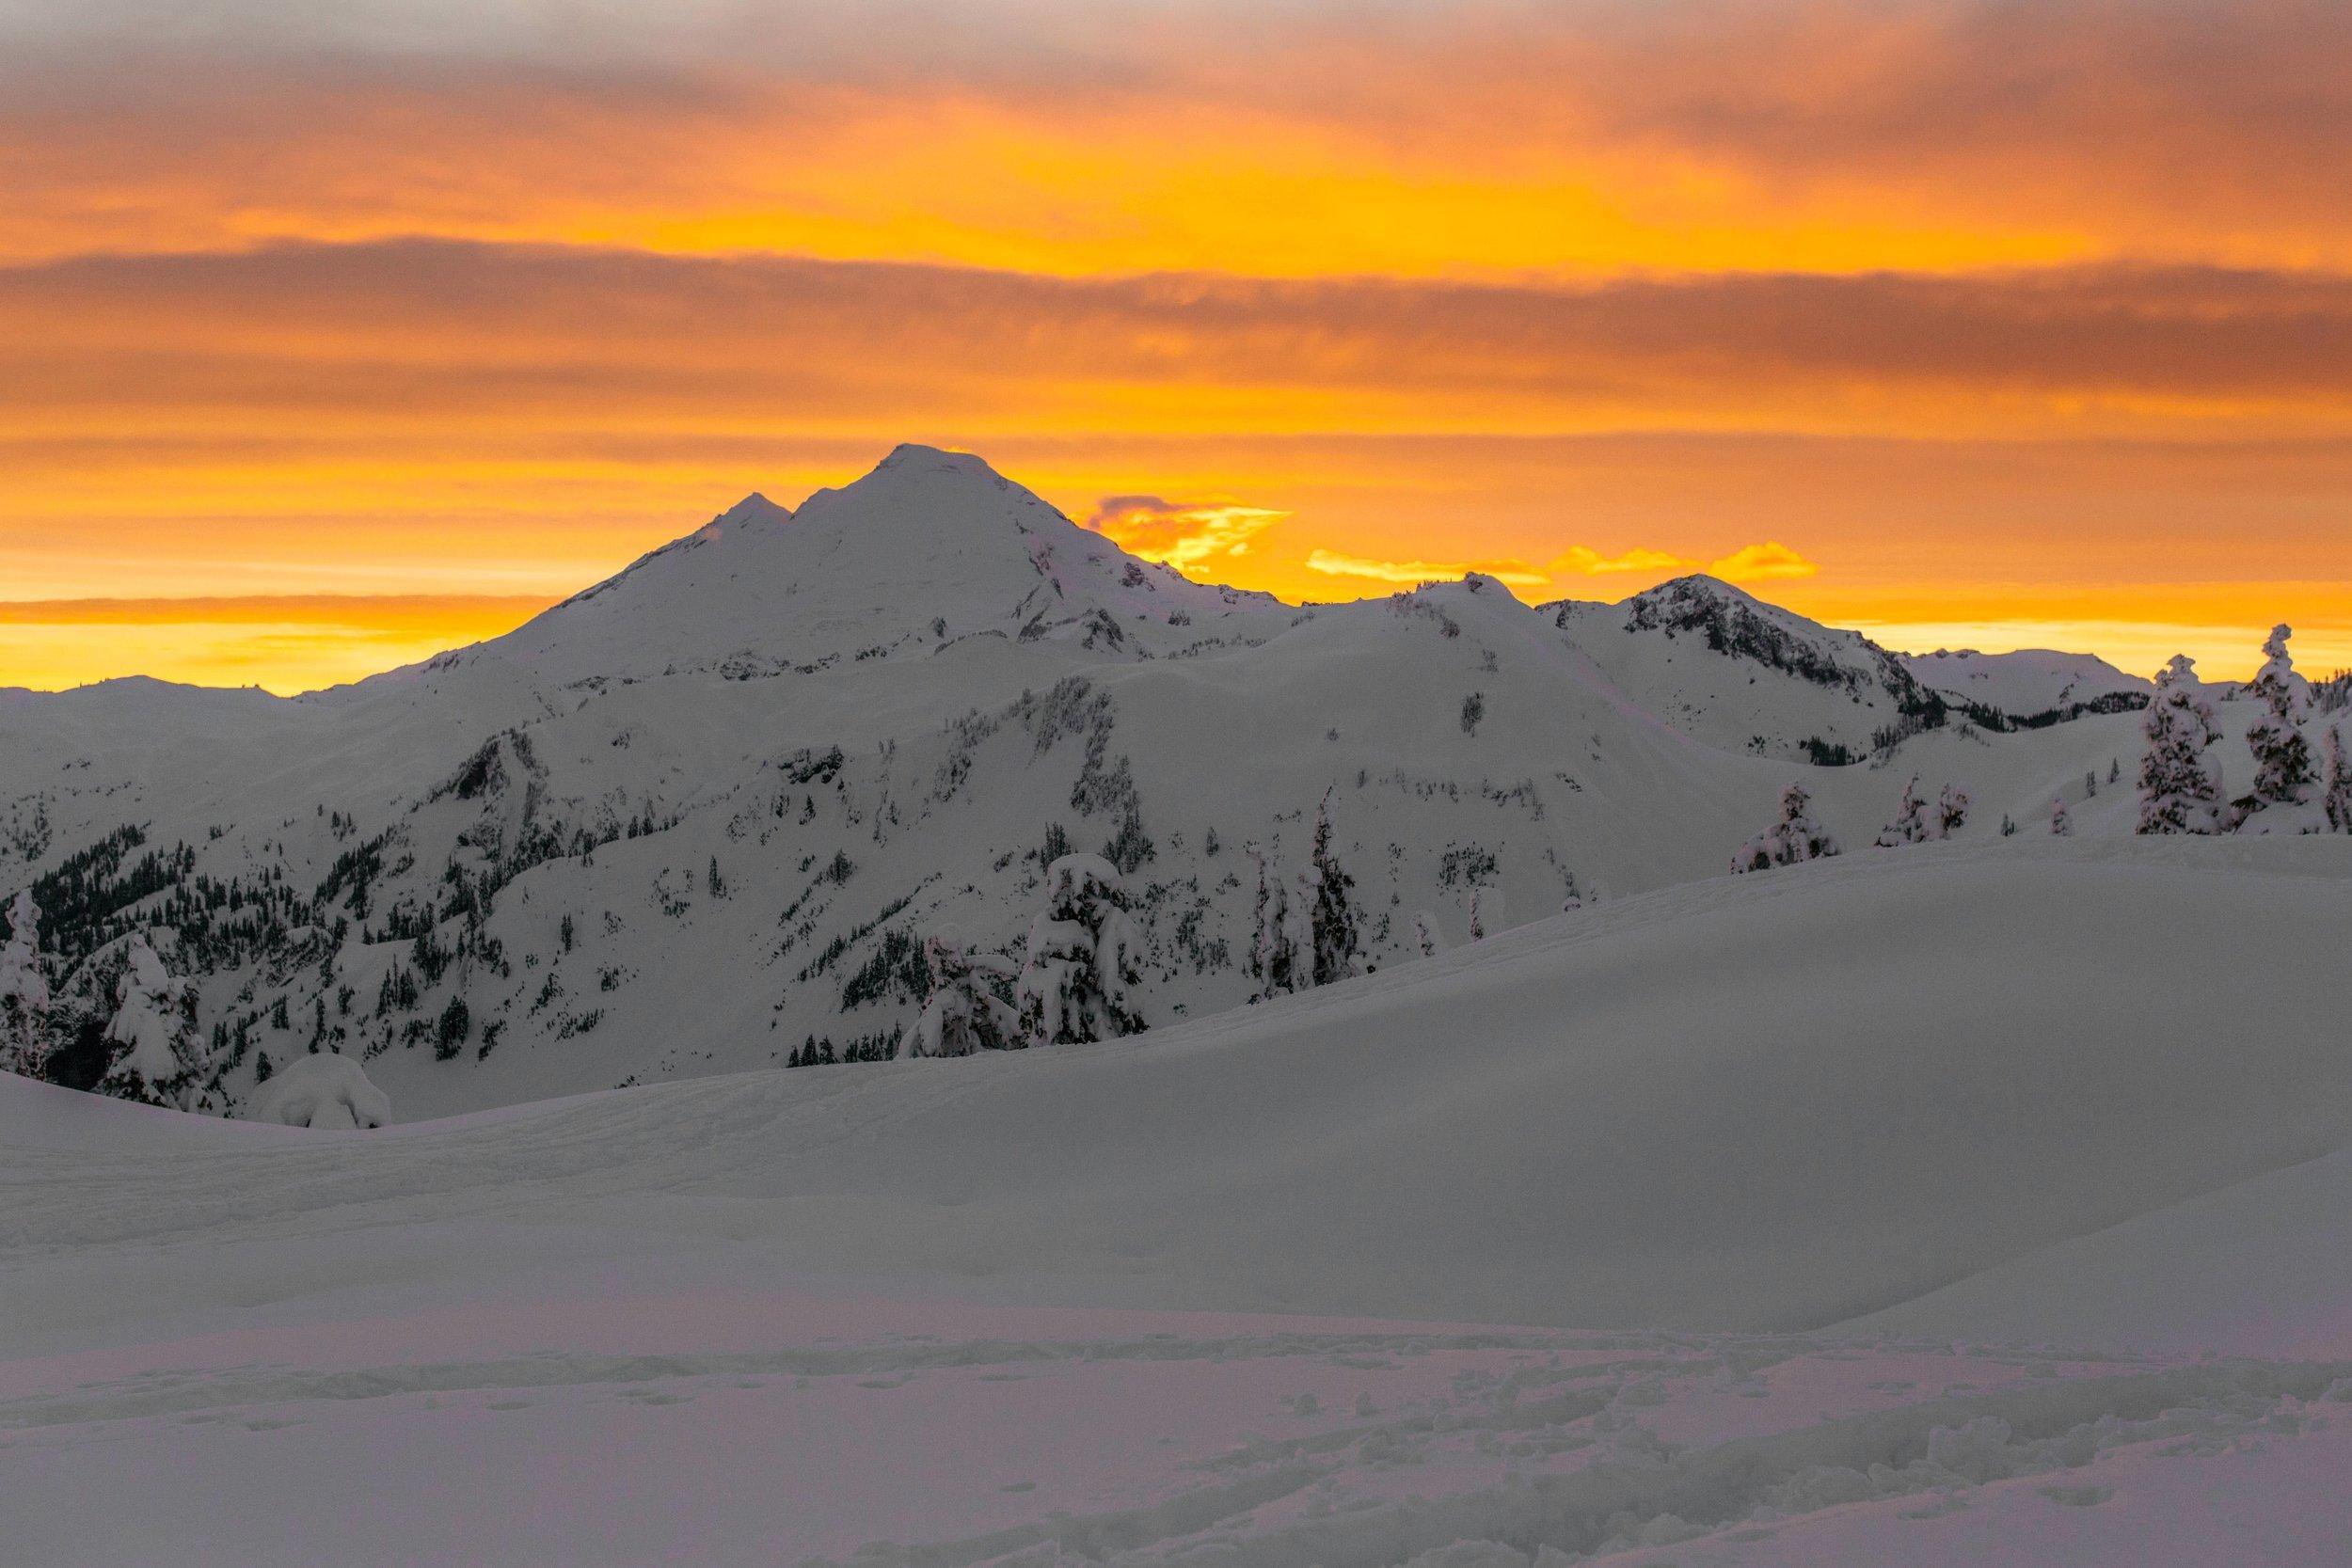 north-cascades-mount-baker-snow-camping-sunset.jpg